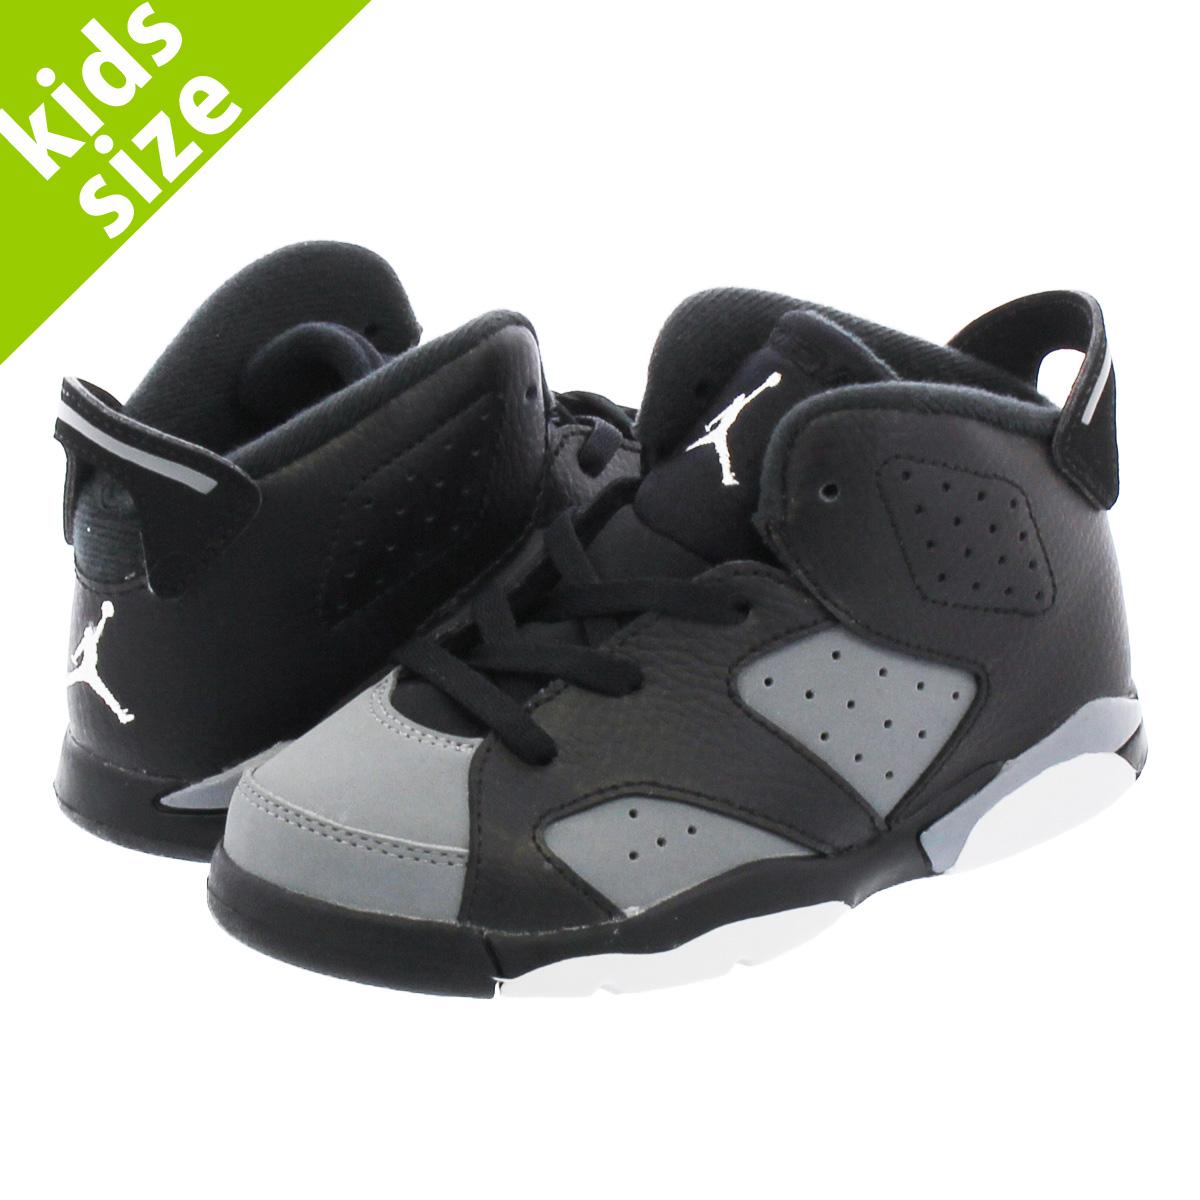 a14e695eeb0 NIKE AIR JORDAN 6 RETRO BT Nike Air Jordan 6 nostalgic BT BLACK/GREY/ ...